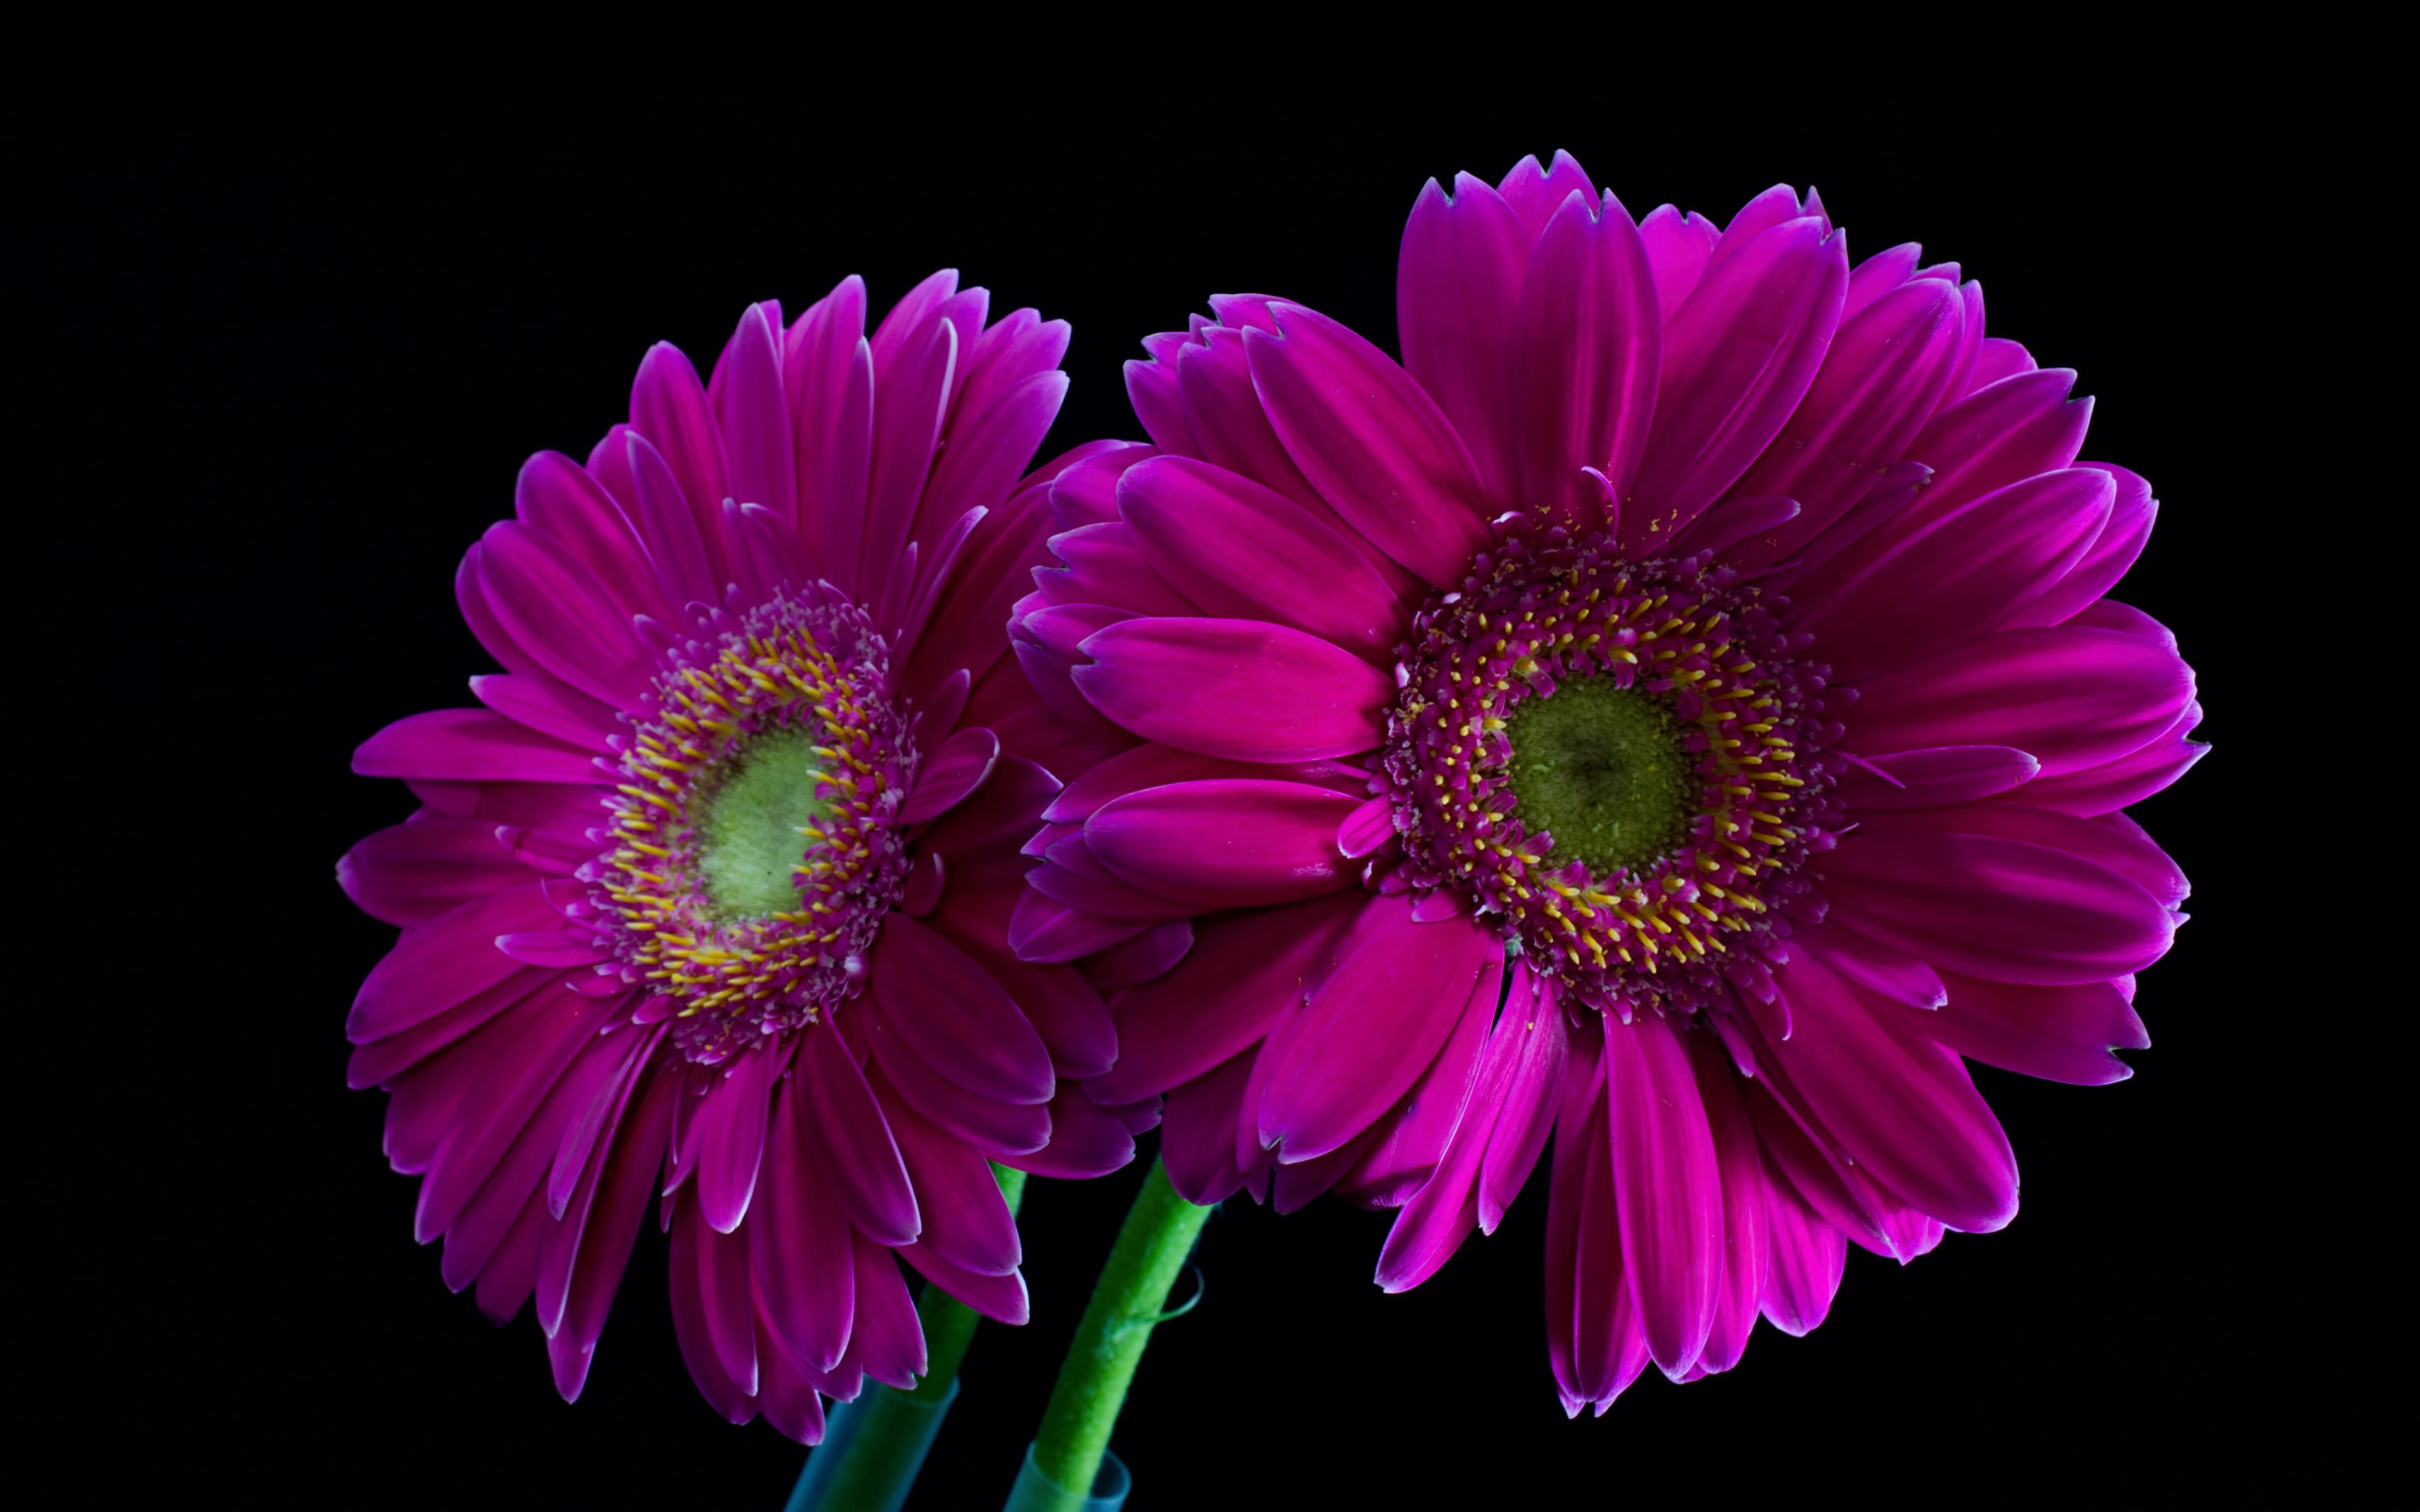 Photo Two Violet Gerberas Flowers Closeup Black background 3840x2400